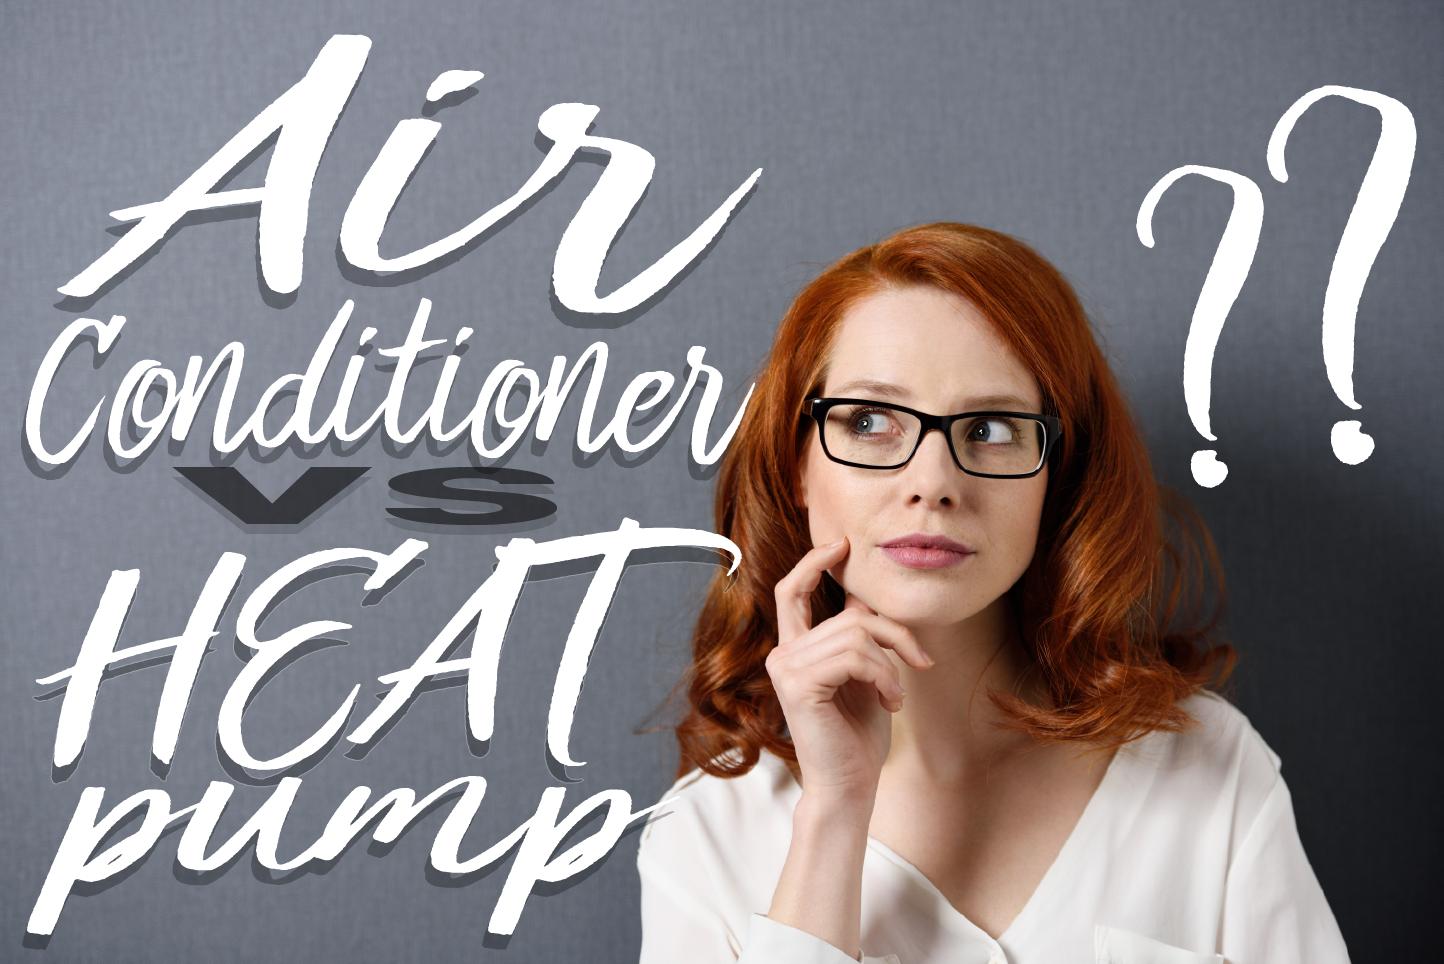 Heat pump vs air conditioner